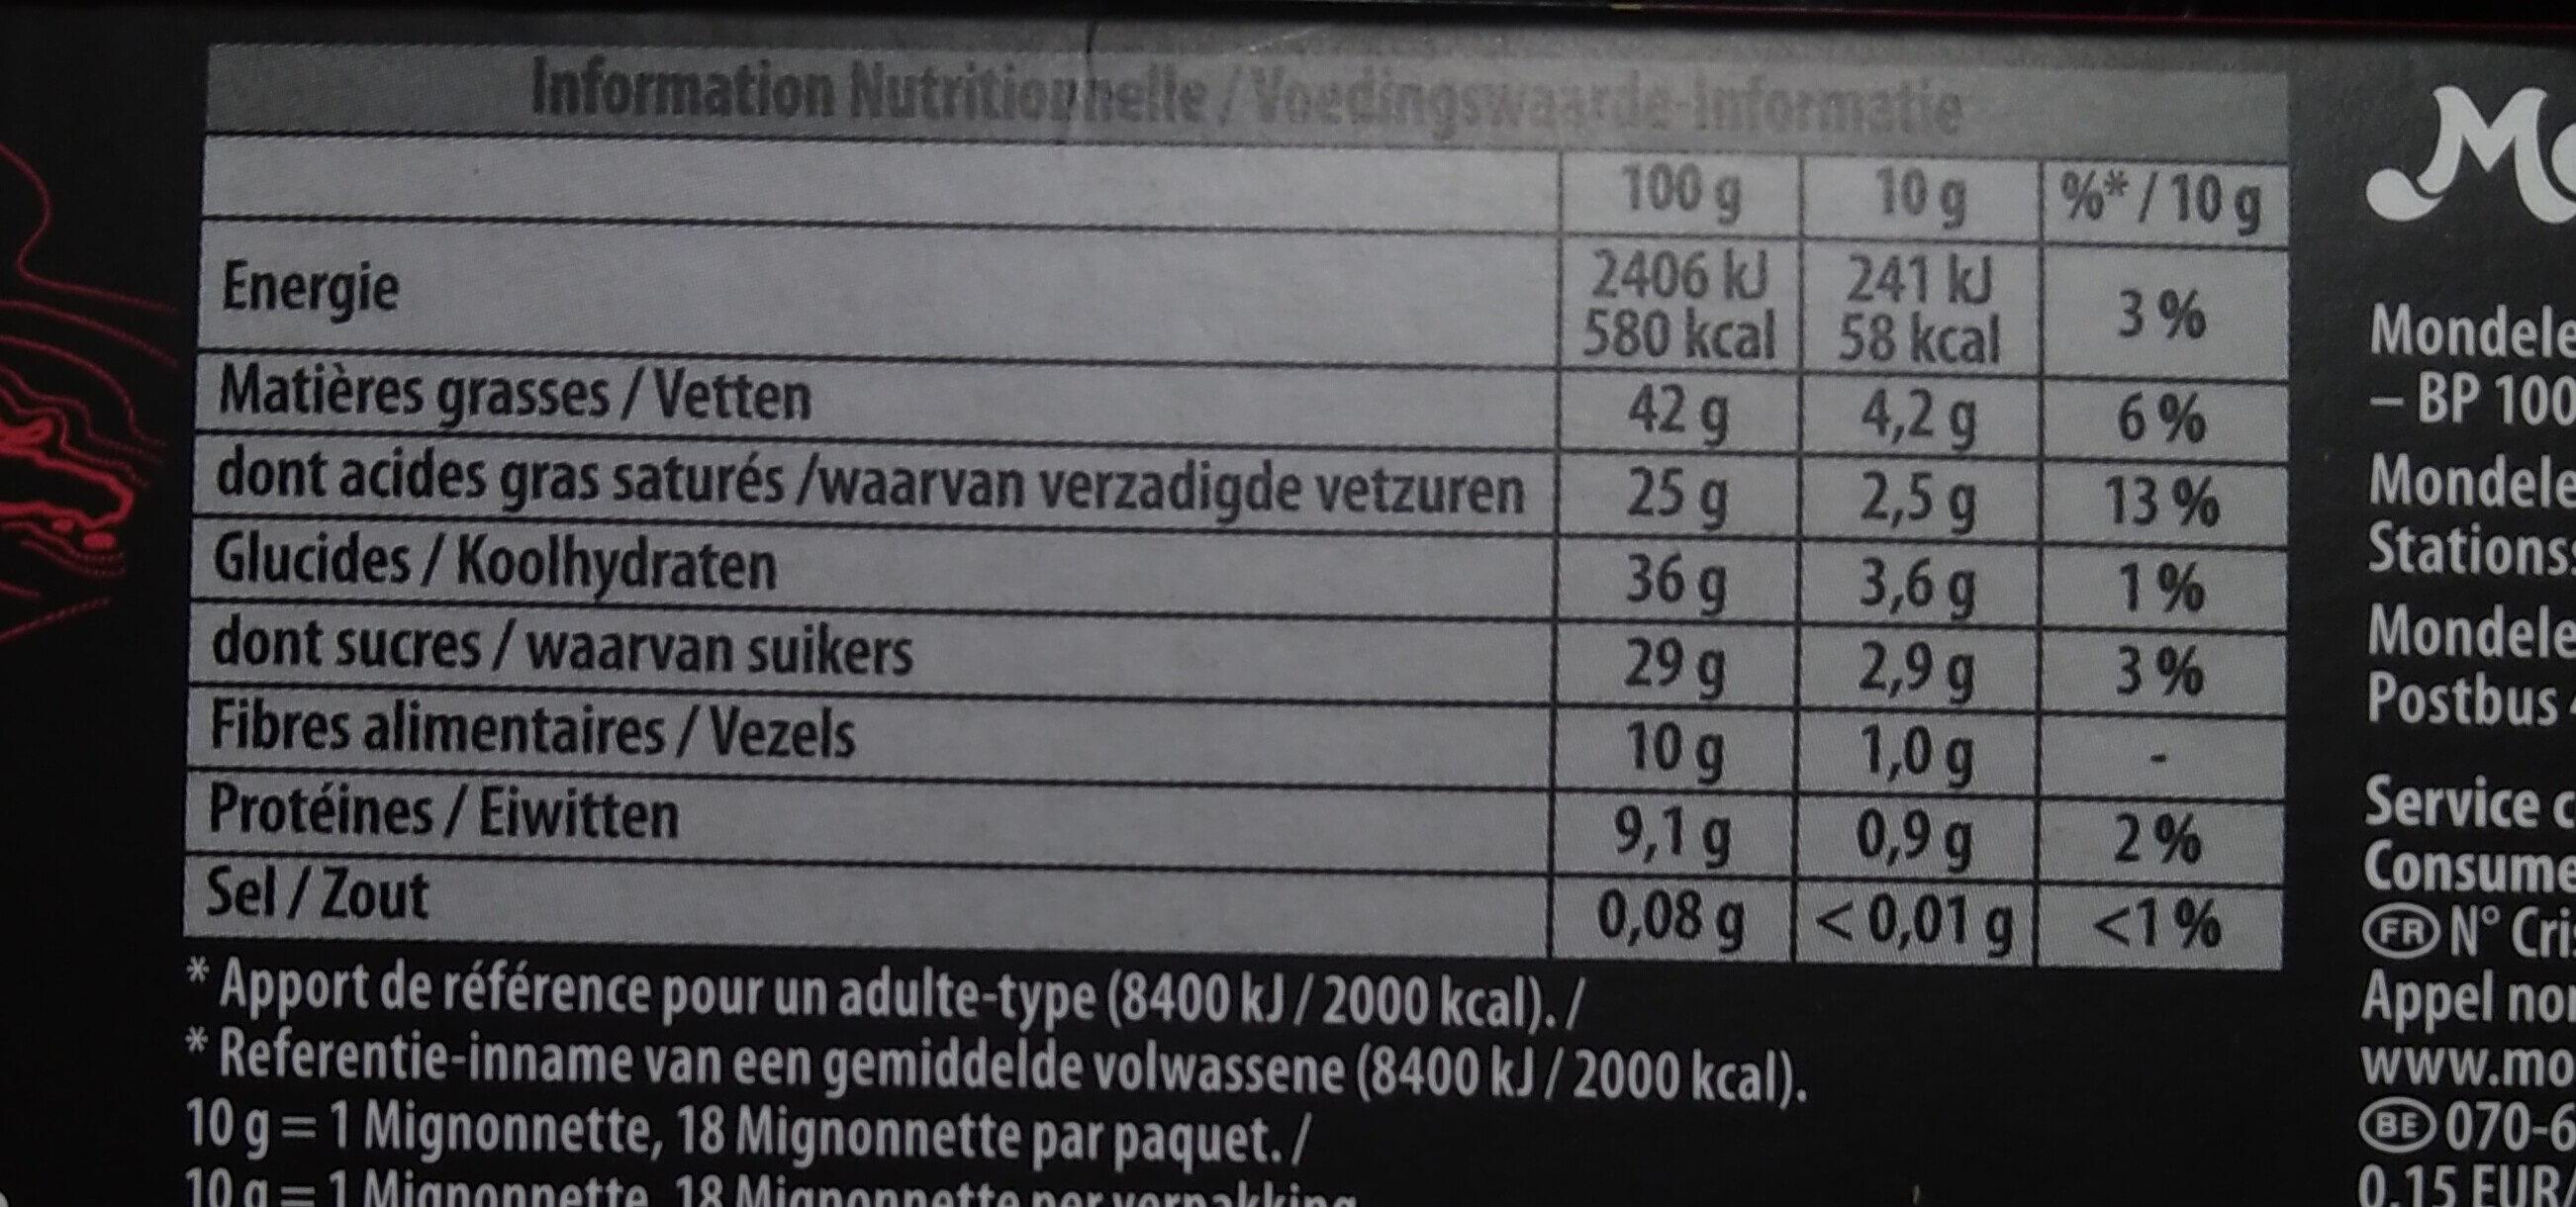 Mignonnette noir 70% - Voedingswaarden - fr